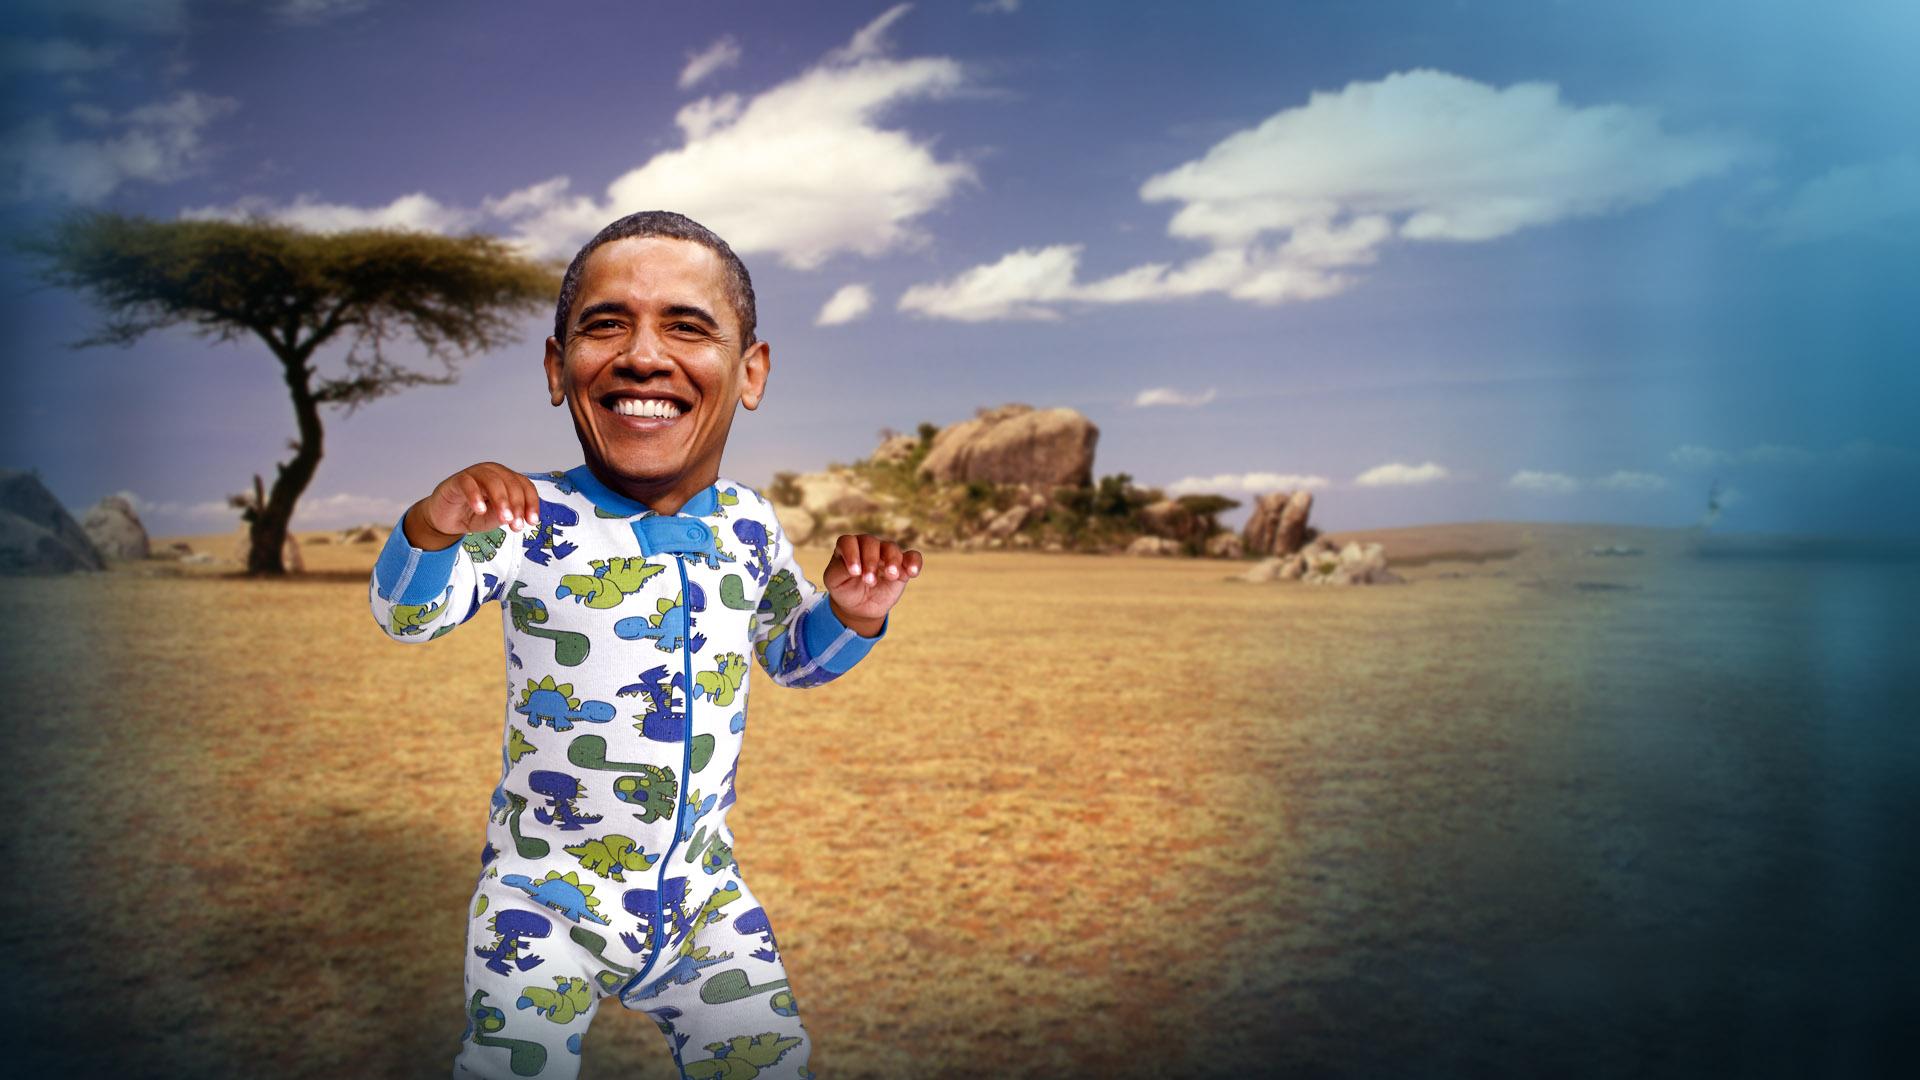 ObamaChildhood.jpg